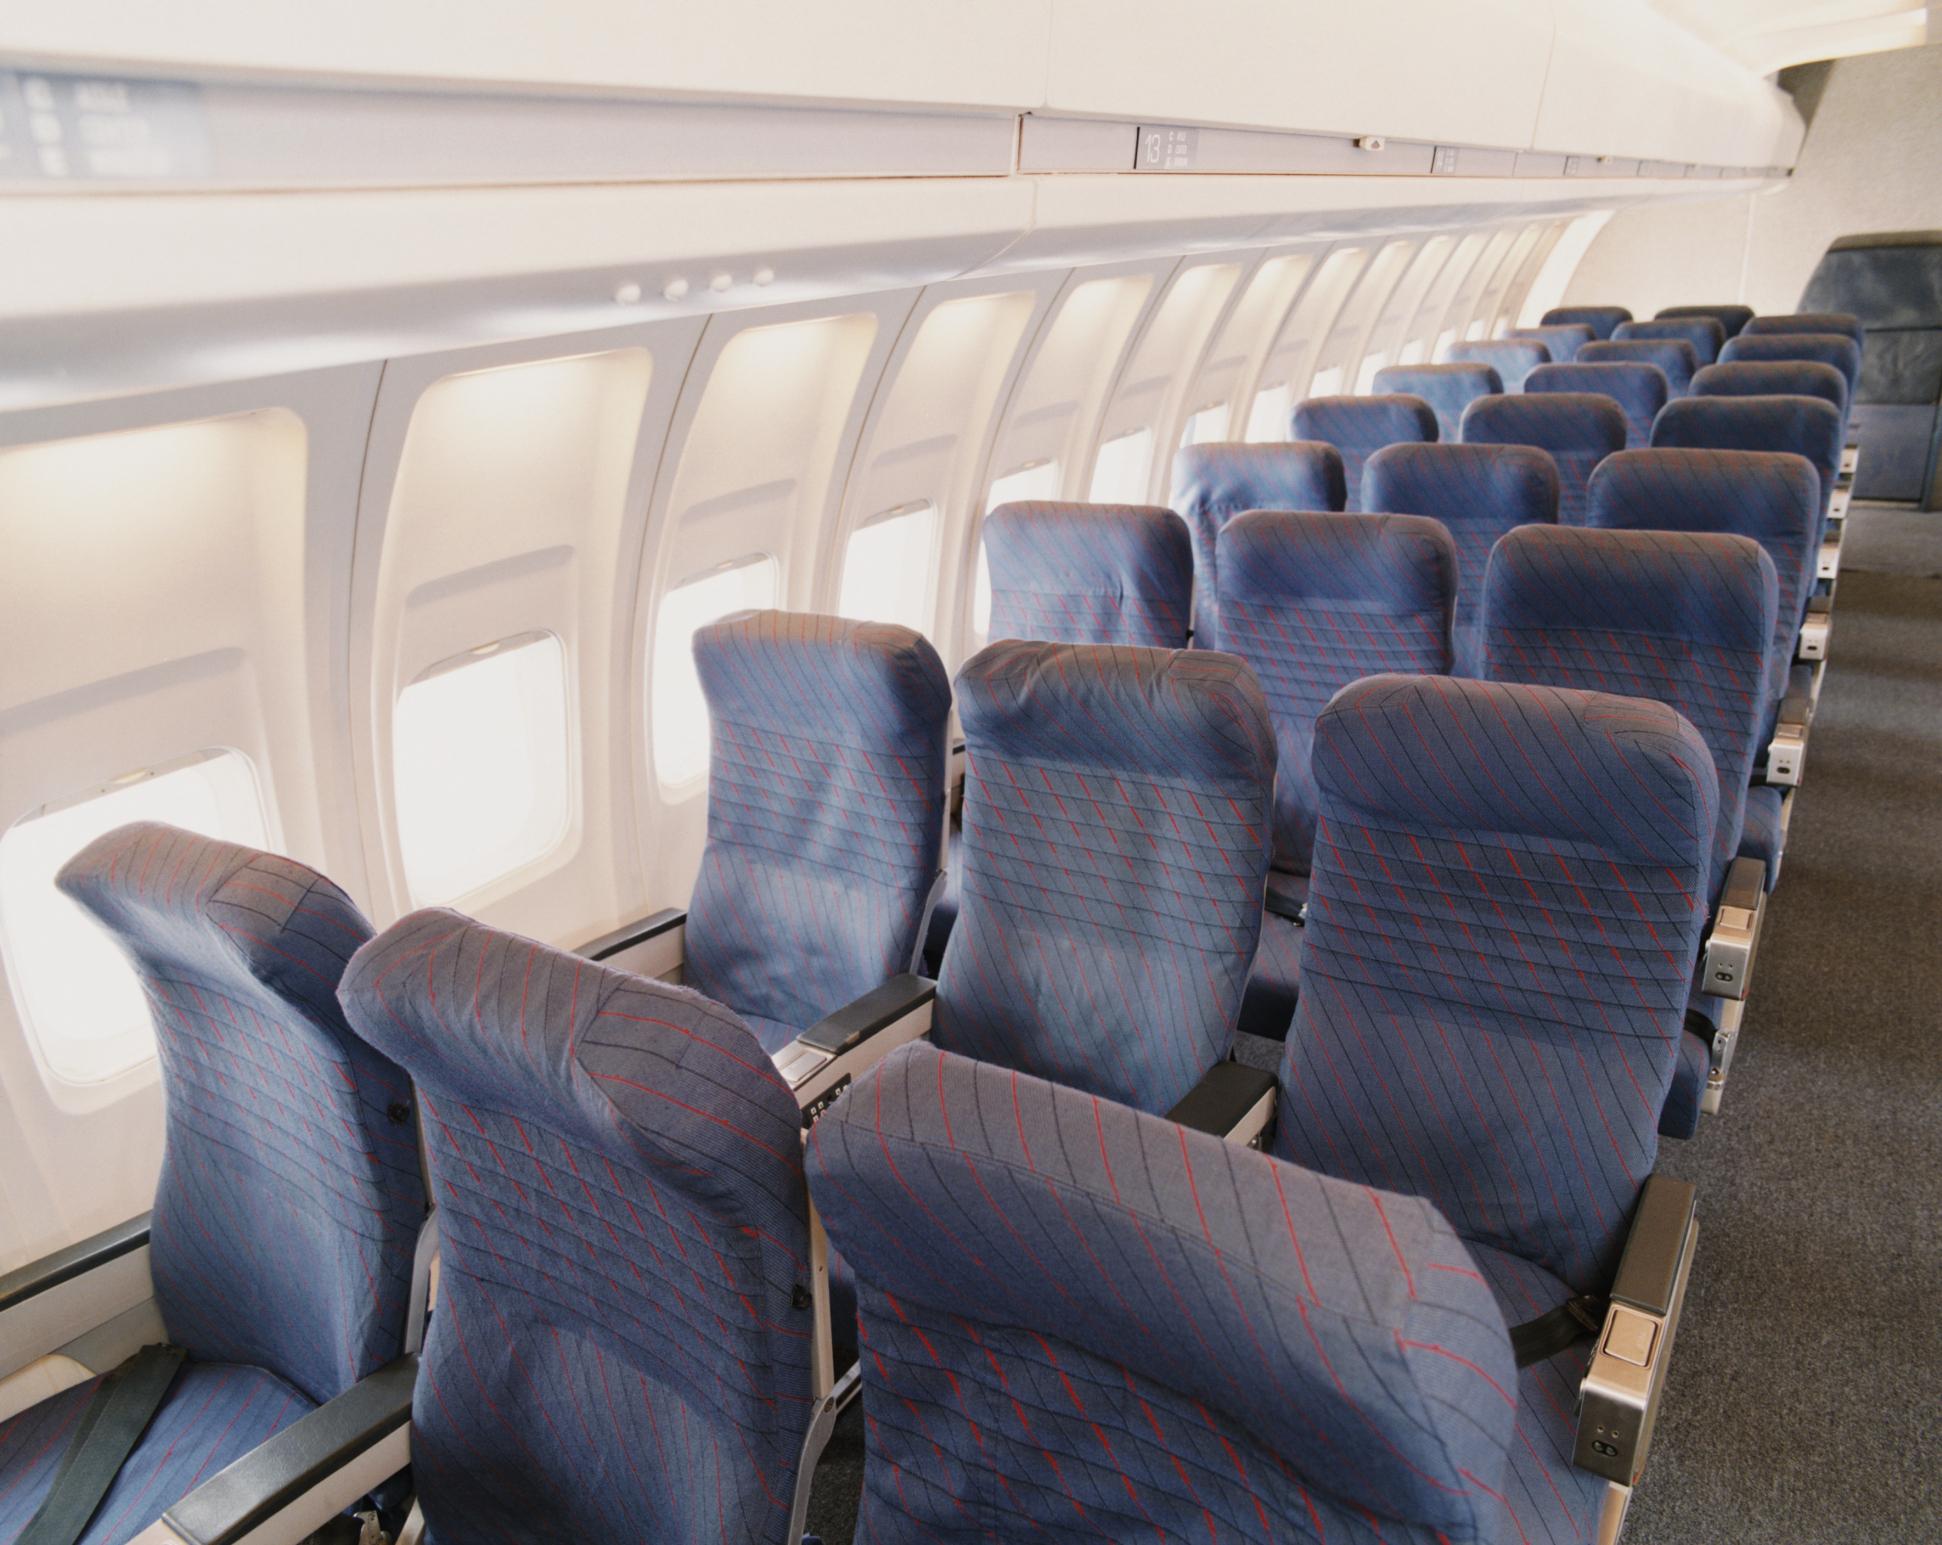 TIA Stroke Risk & Plane Travel